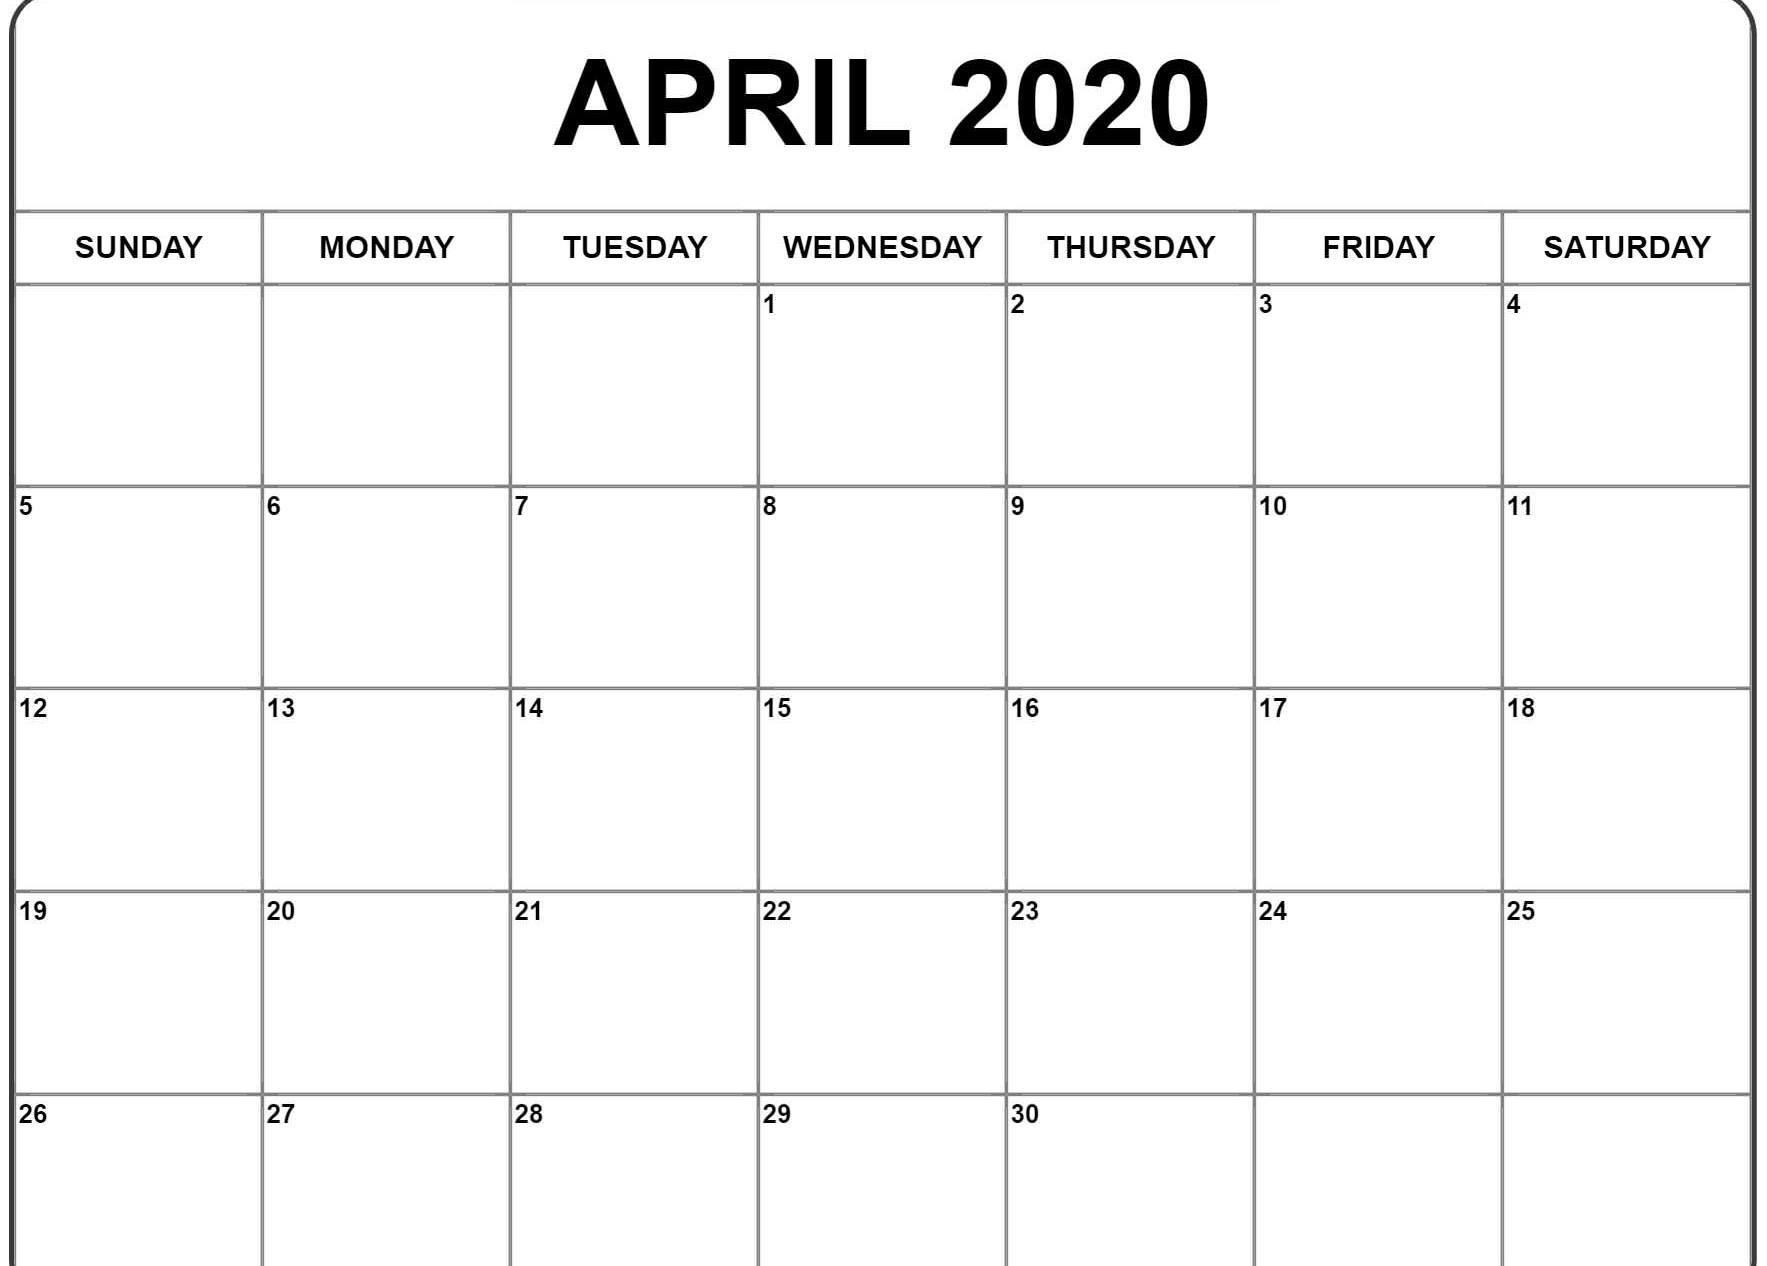 April 2020 Calendar Printable.April 2020 Calendar Blank Template Free Printable Calendar